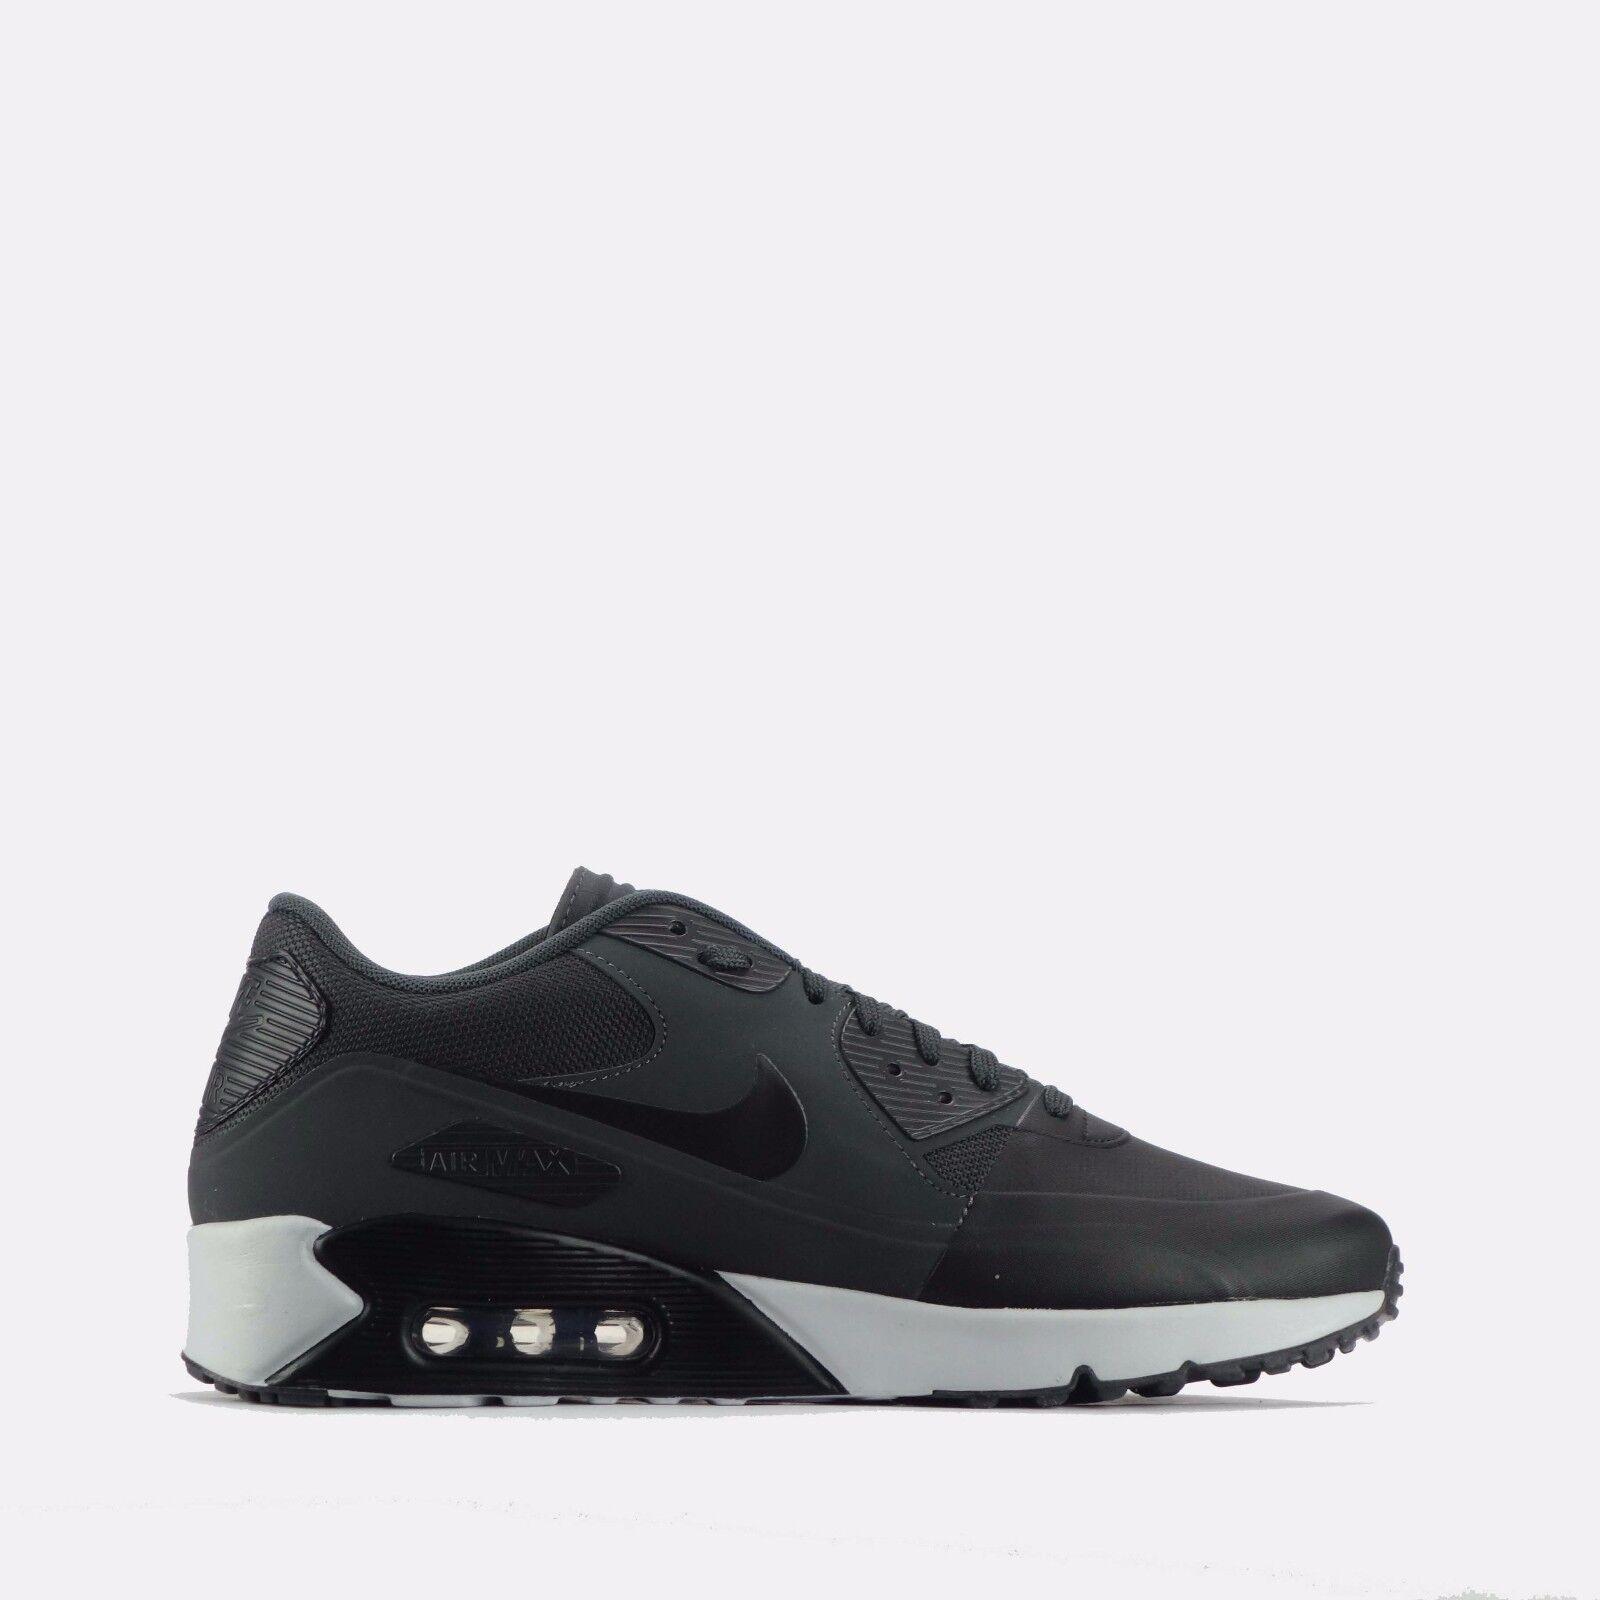 Nike Air Max 90 Ultra 2.0 SE SE SE Men's shoes Black Anthracite 50b041